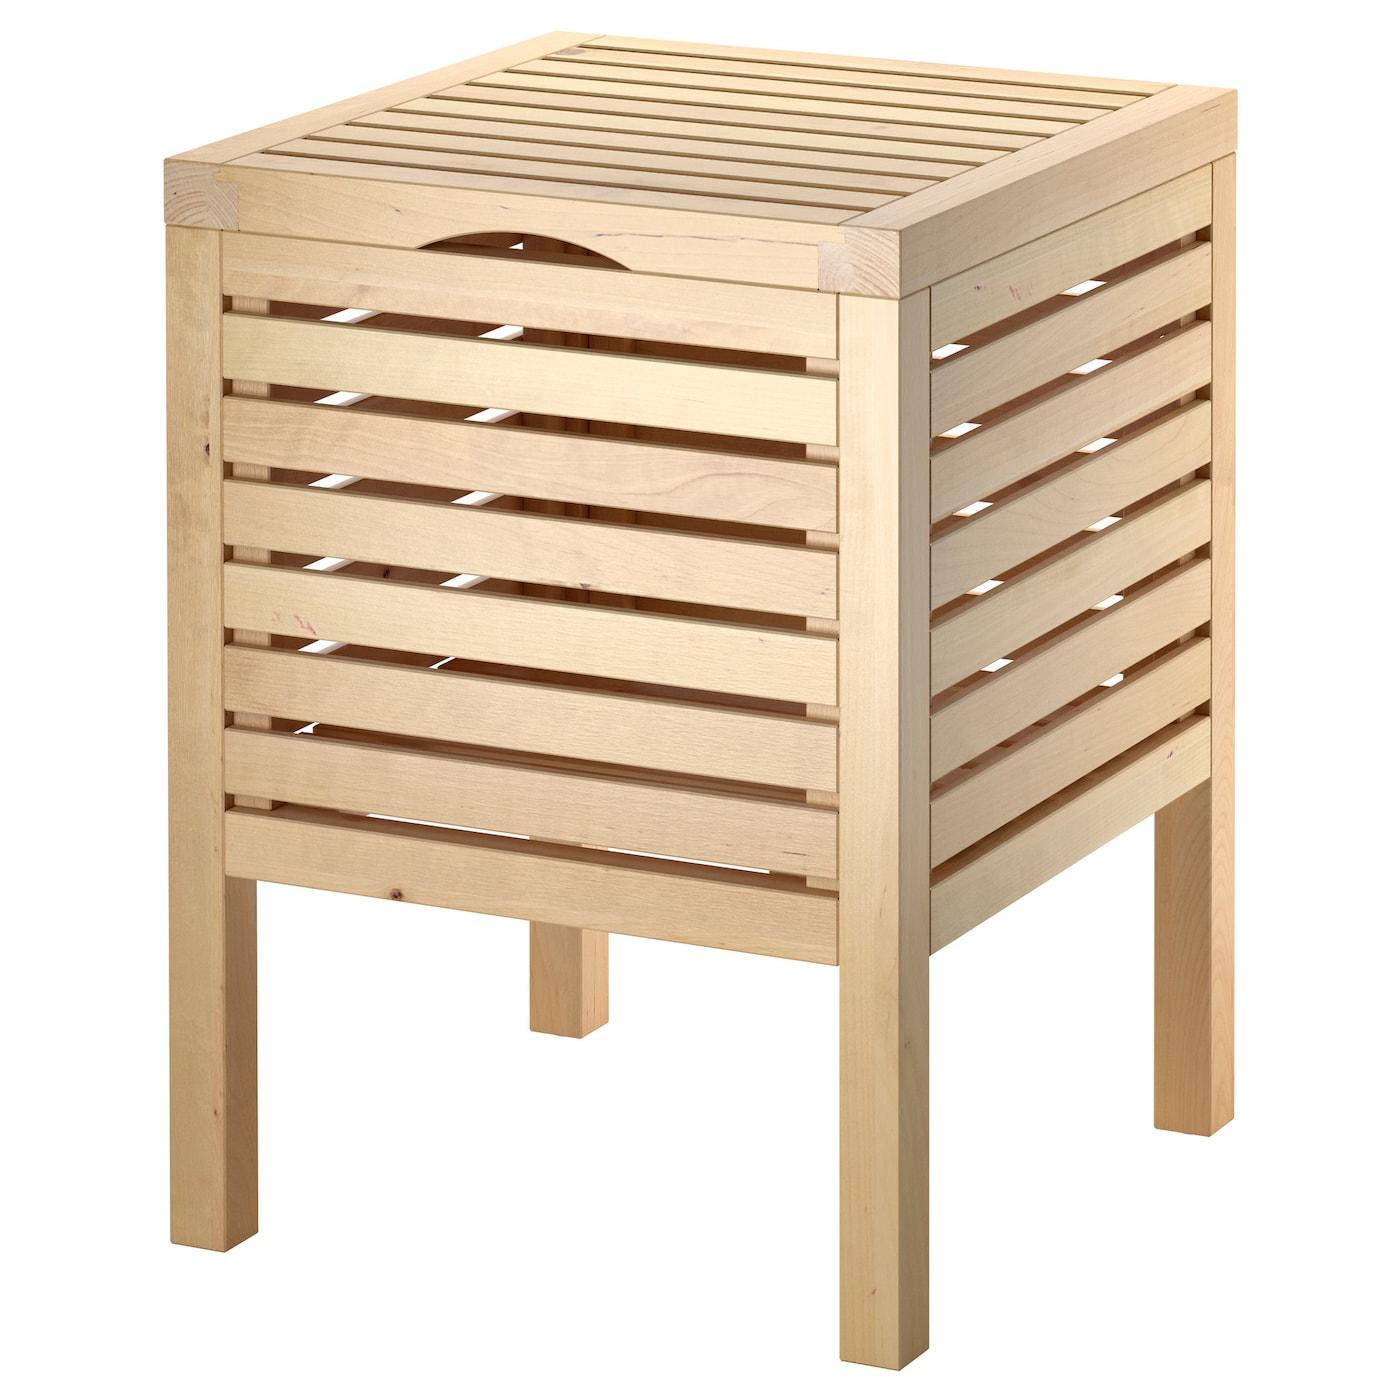 IKEA MOLGER Storage Stool